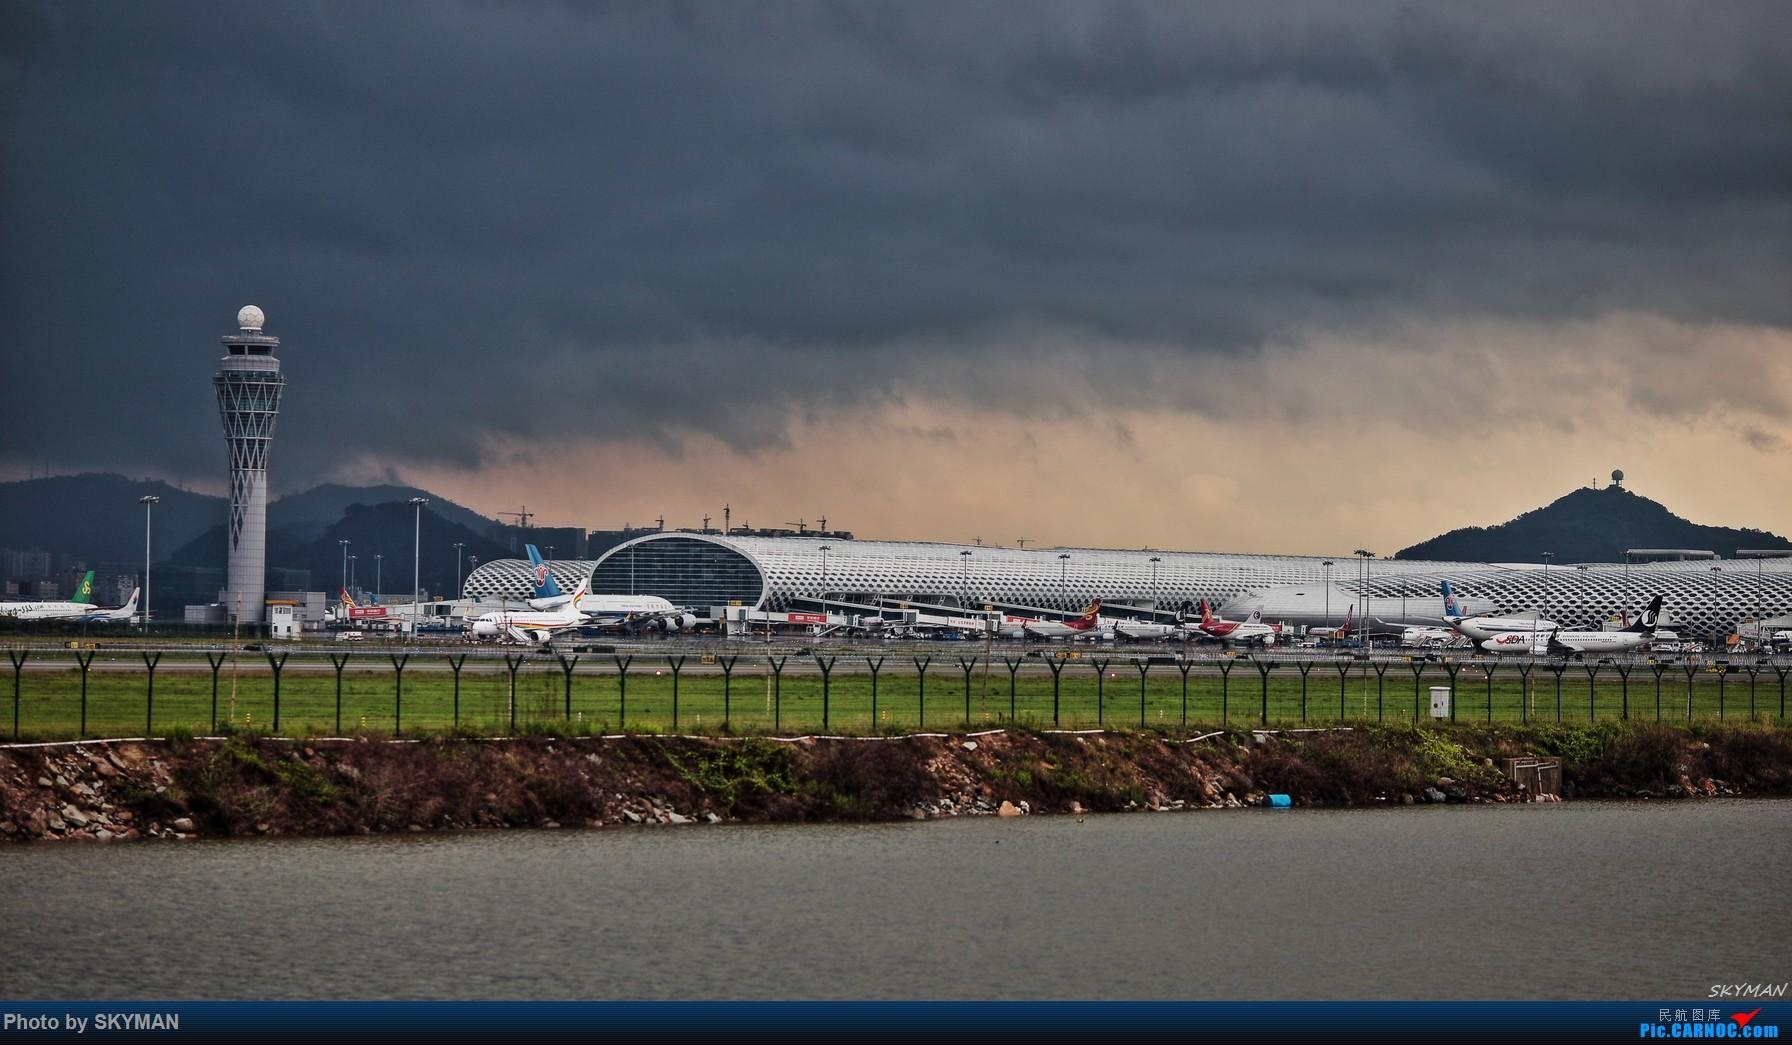 Re:[原创]BLDDQ  5.11 深圳机场龙卷风    中国深圳宝安国际机场